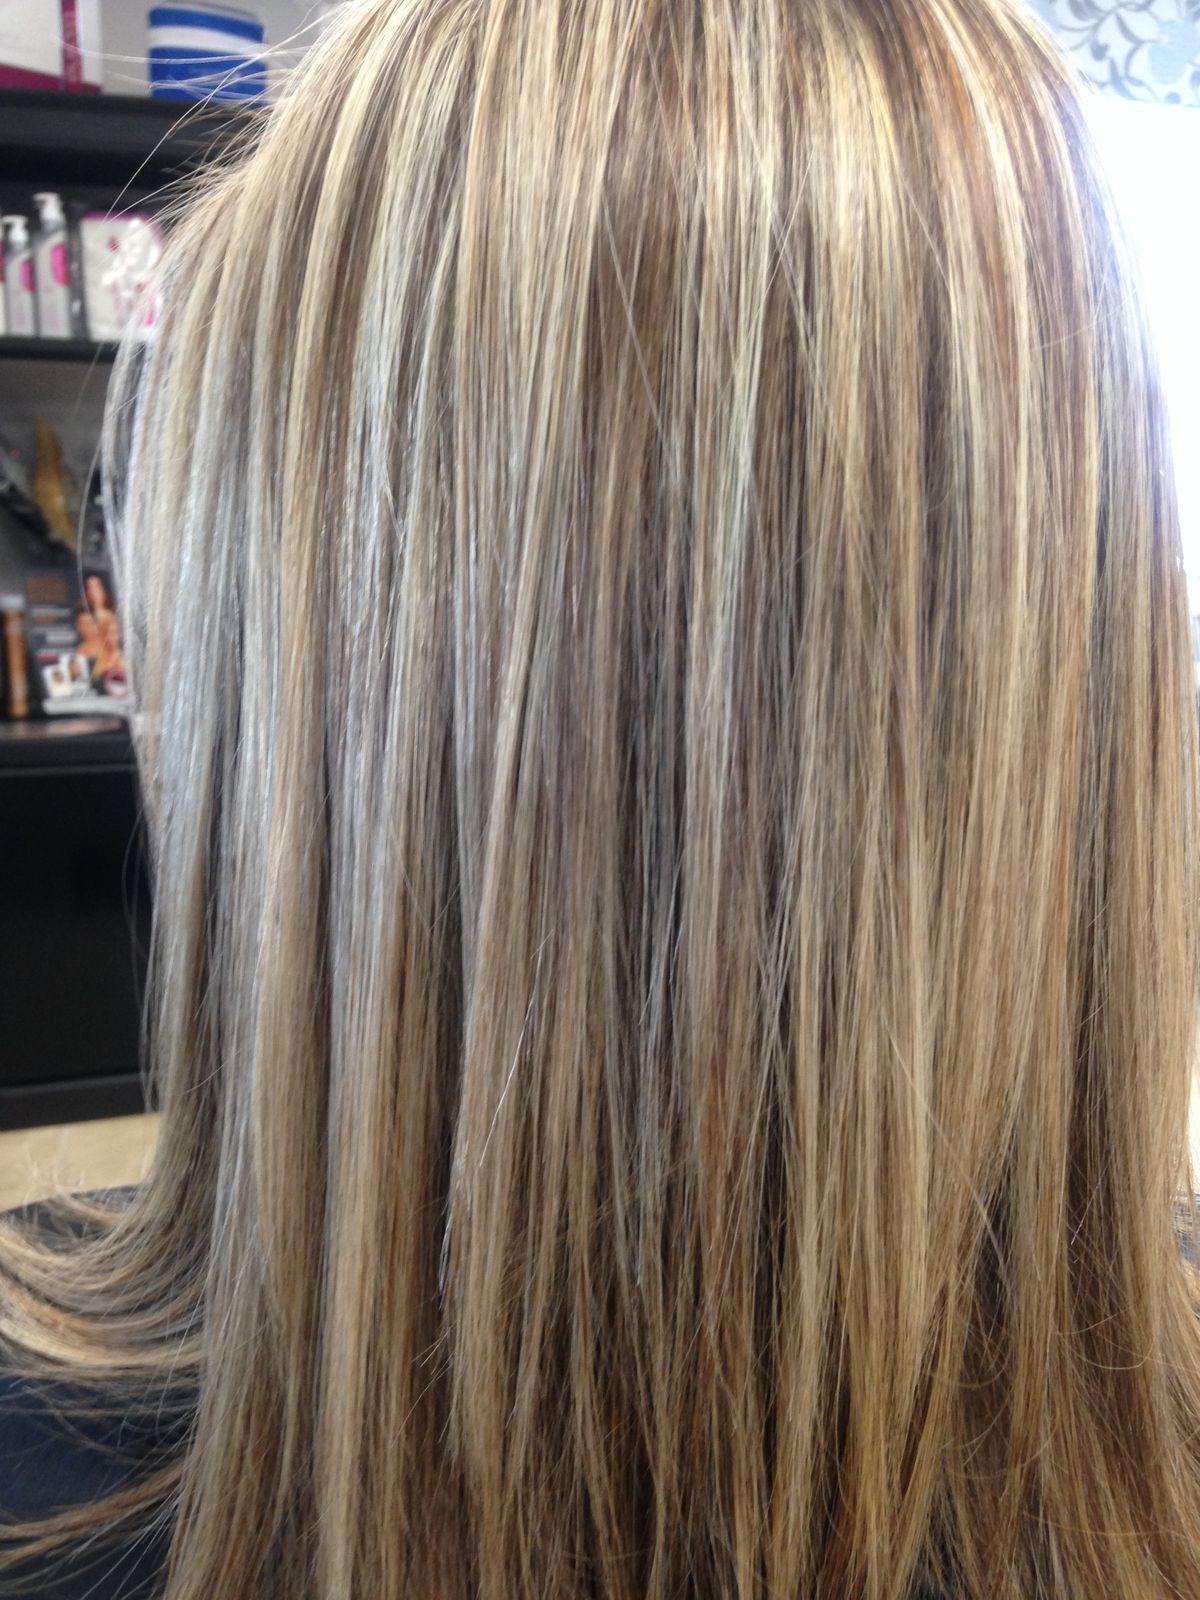 The Best Platinum Blonde Highlights Brown Hair With Blonde Highlights Hair Styles Blonde Hair Color